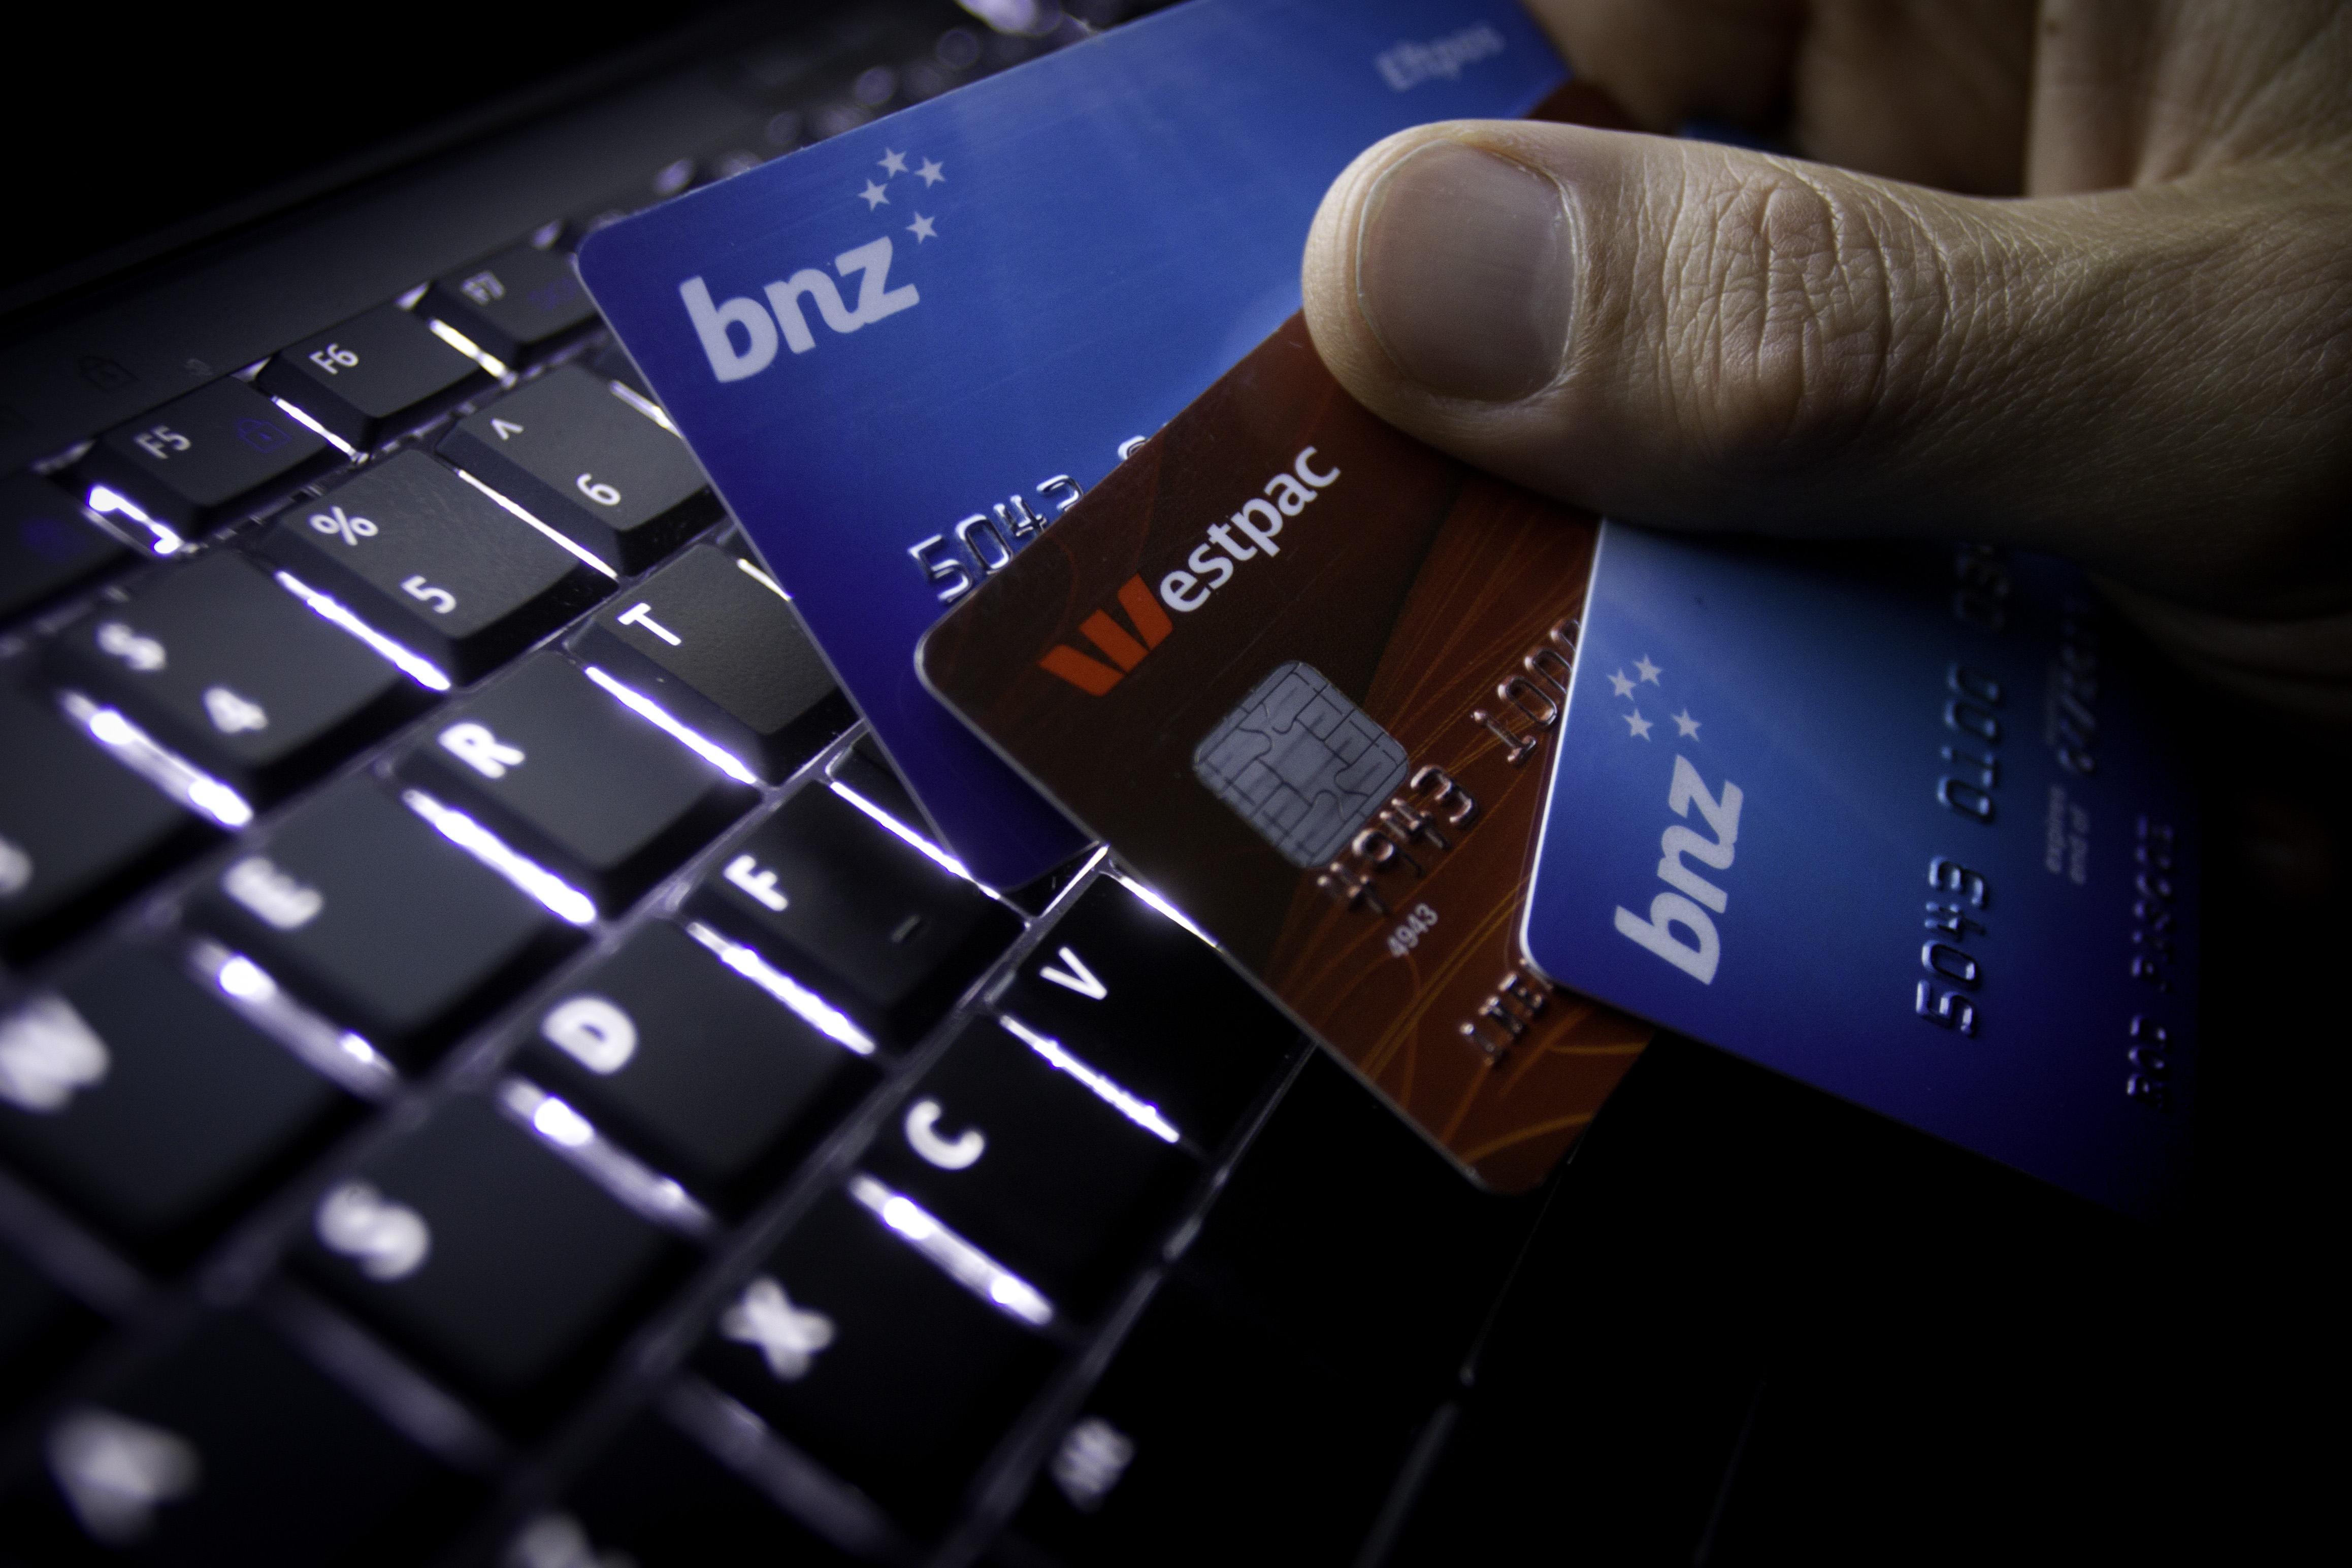 How do I transfer money from Kiwi to my phone Basic moments